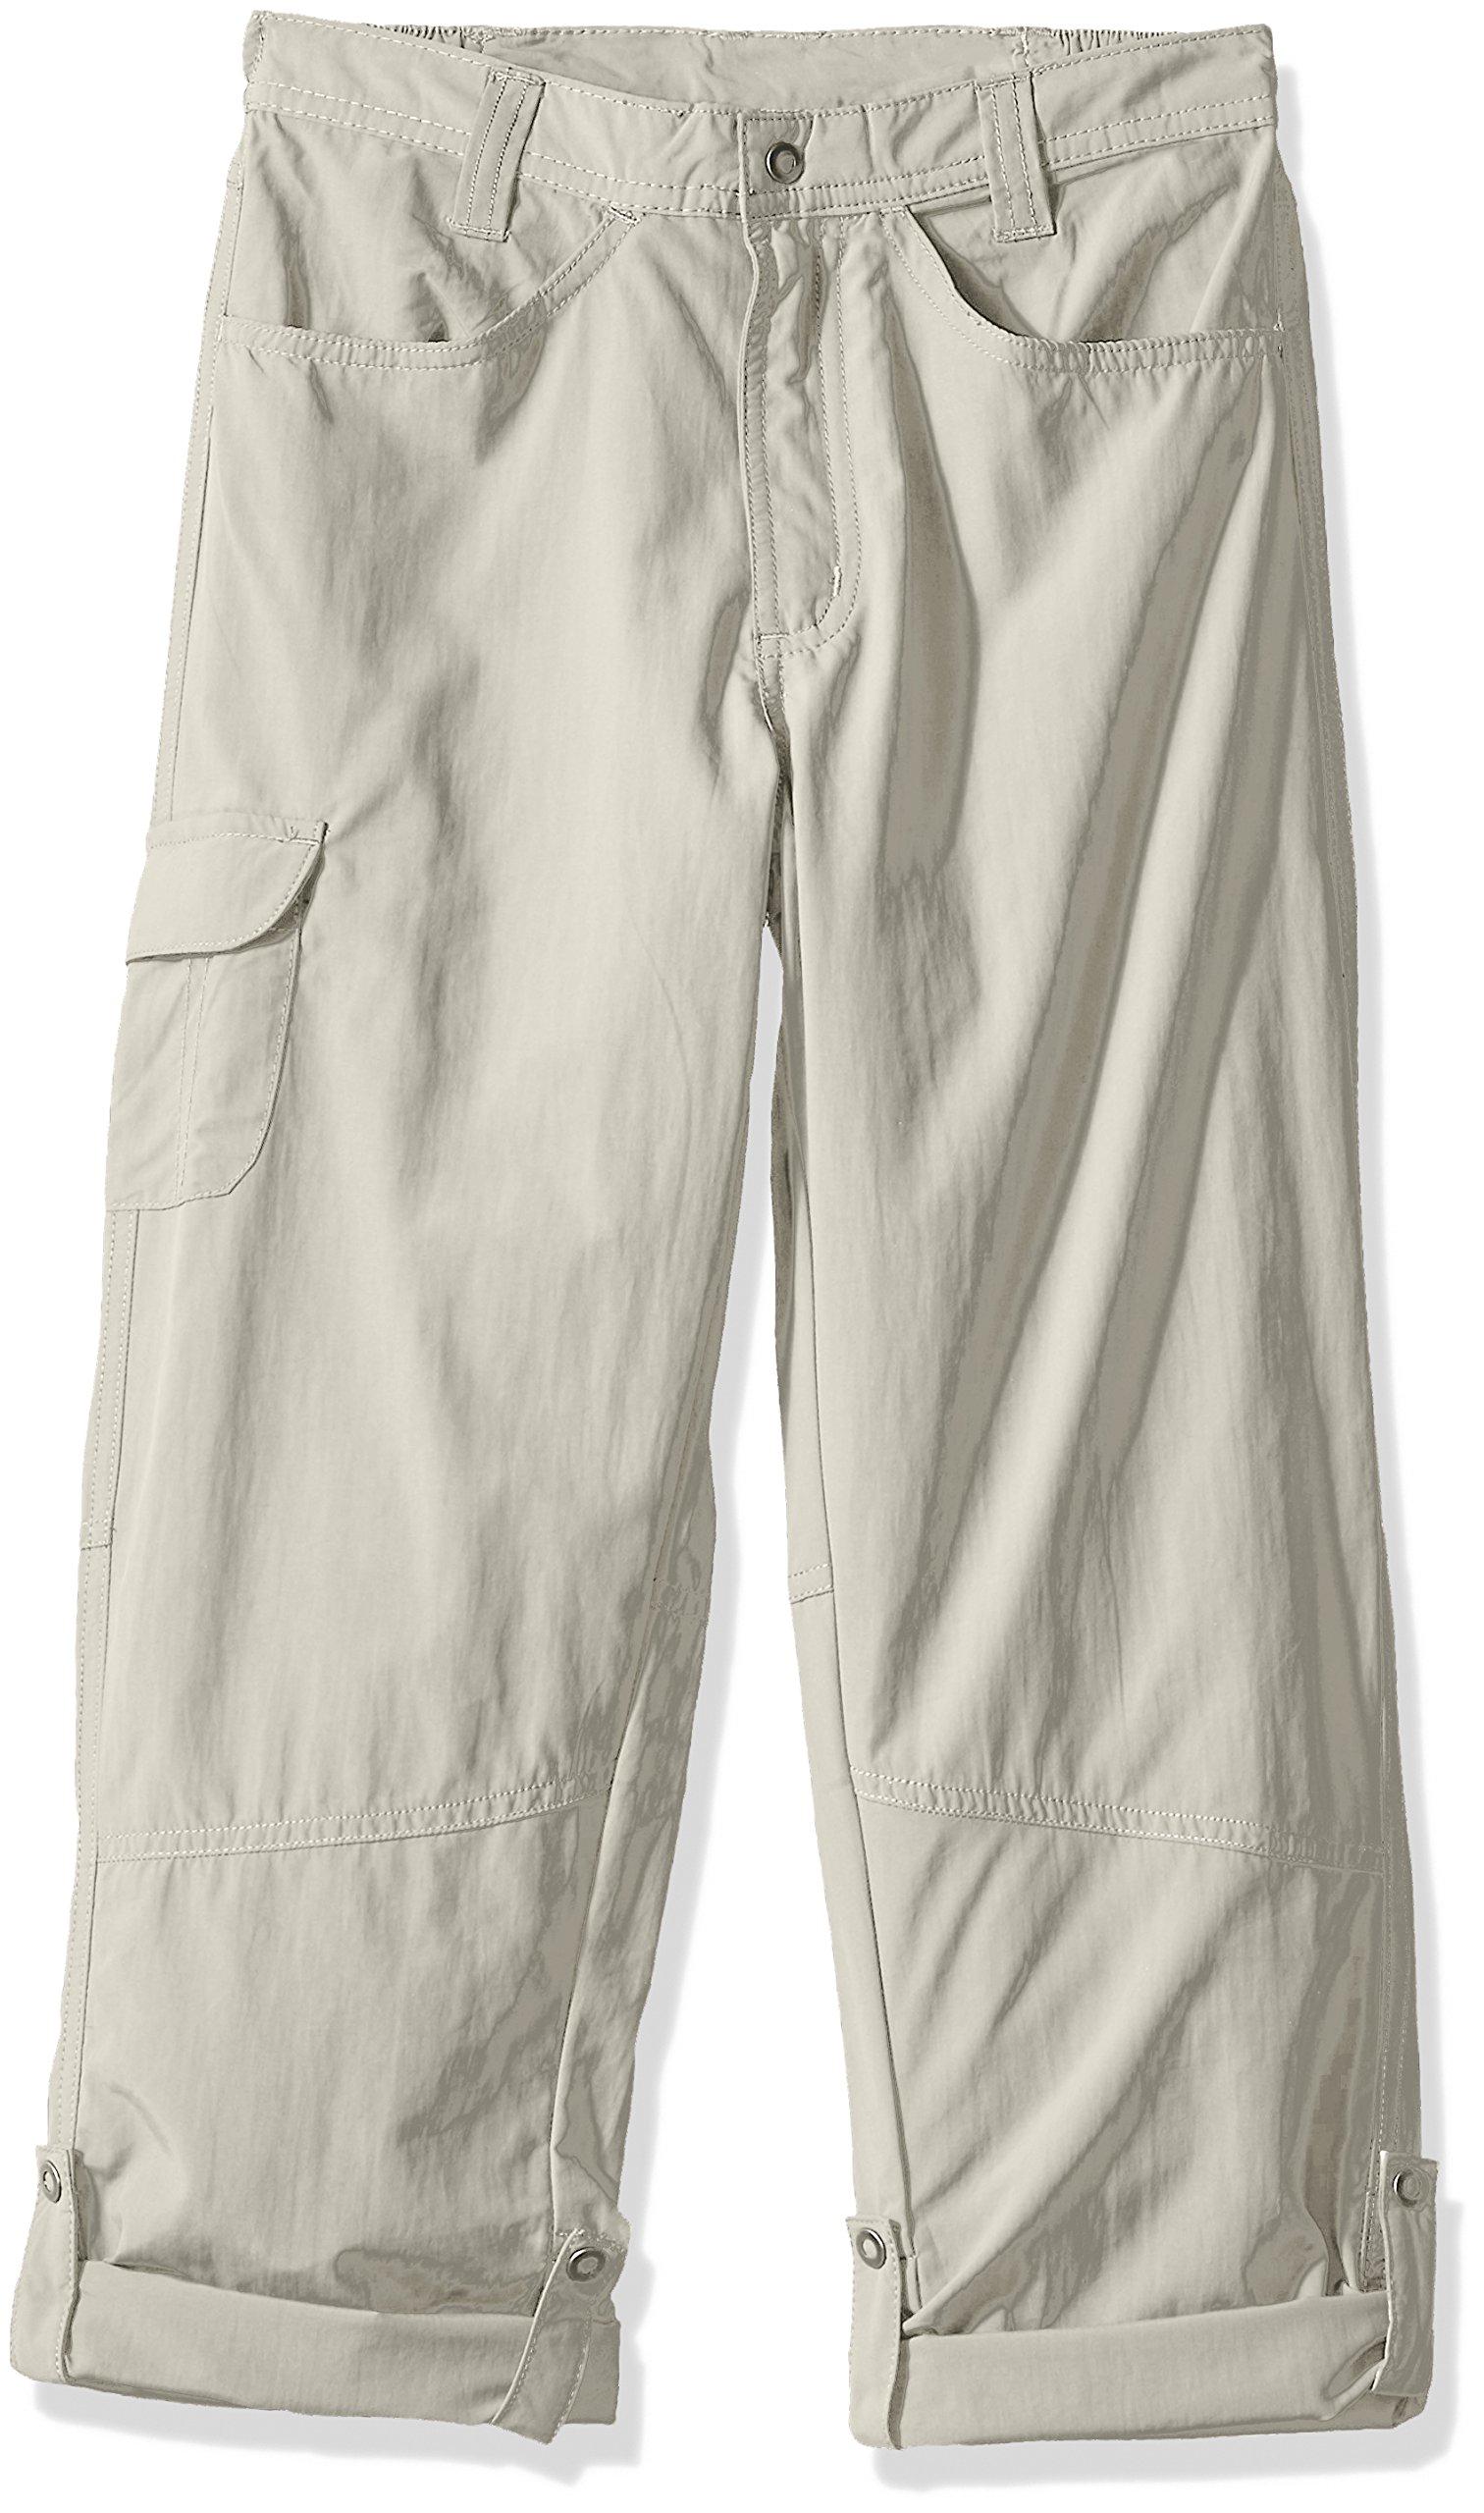 White Sierra Girls Pt. Roll Up Pants, Pale Taupe, Medium